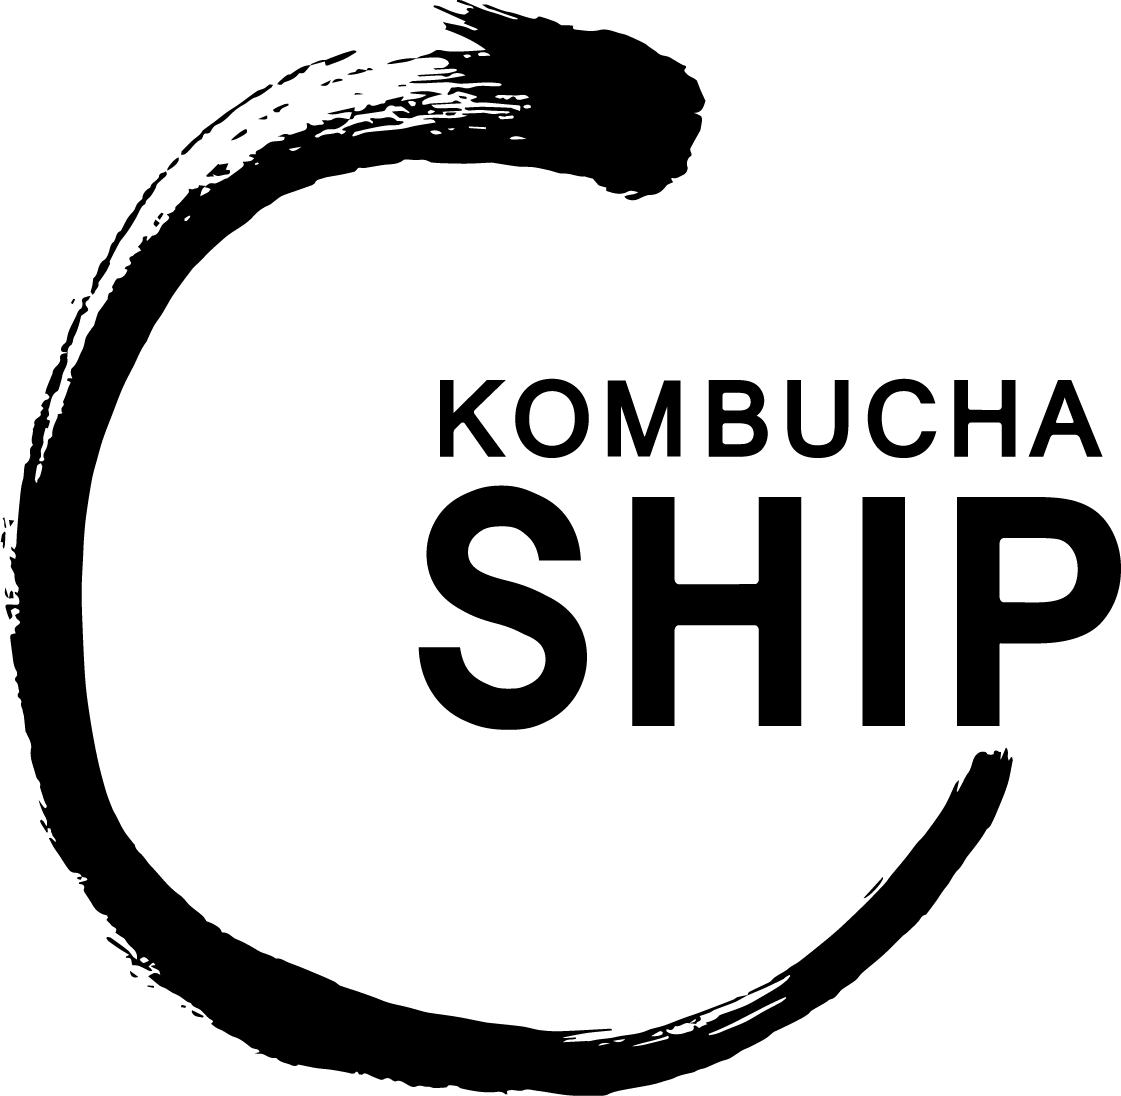 KOMBUCHA_SHIP